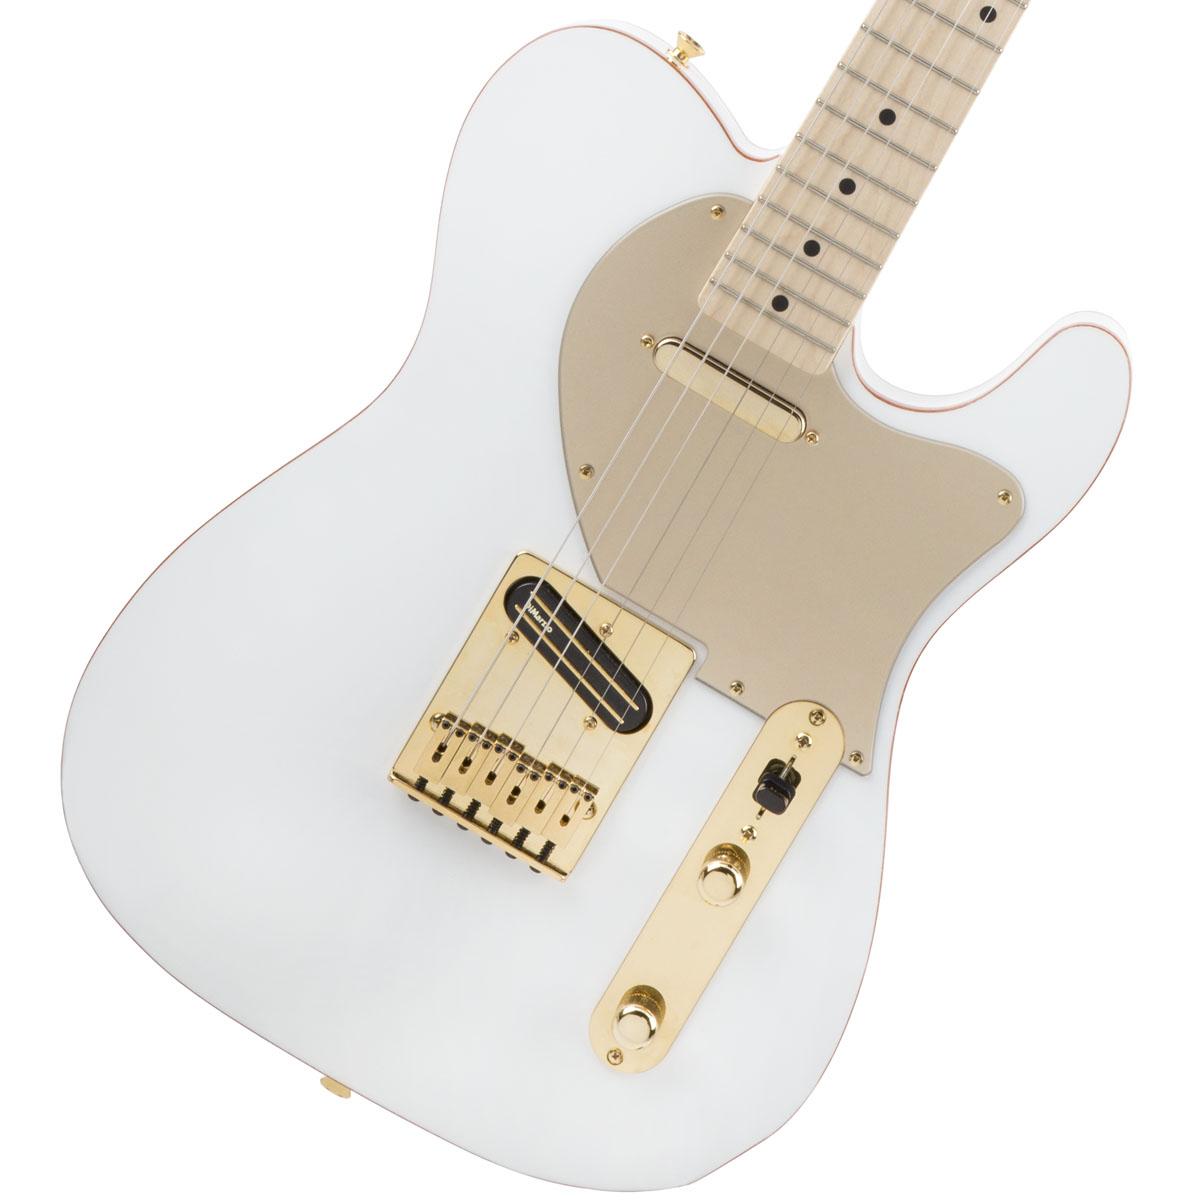 Fender / HARUNA TELECASTER Arctic White 《カスタムショップのお手入れ用品を進呈/+671038200》【YRK】